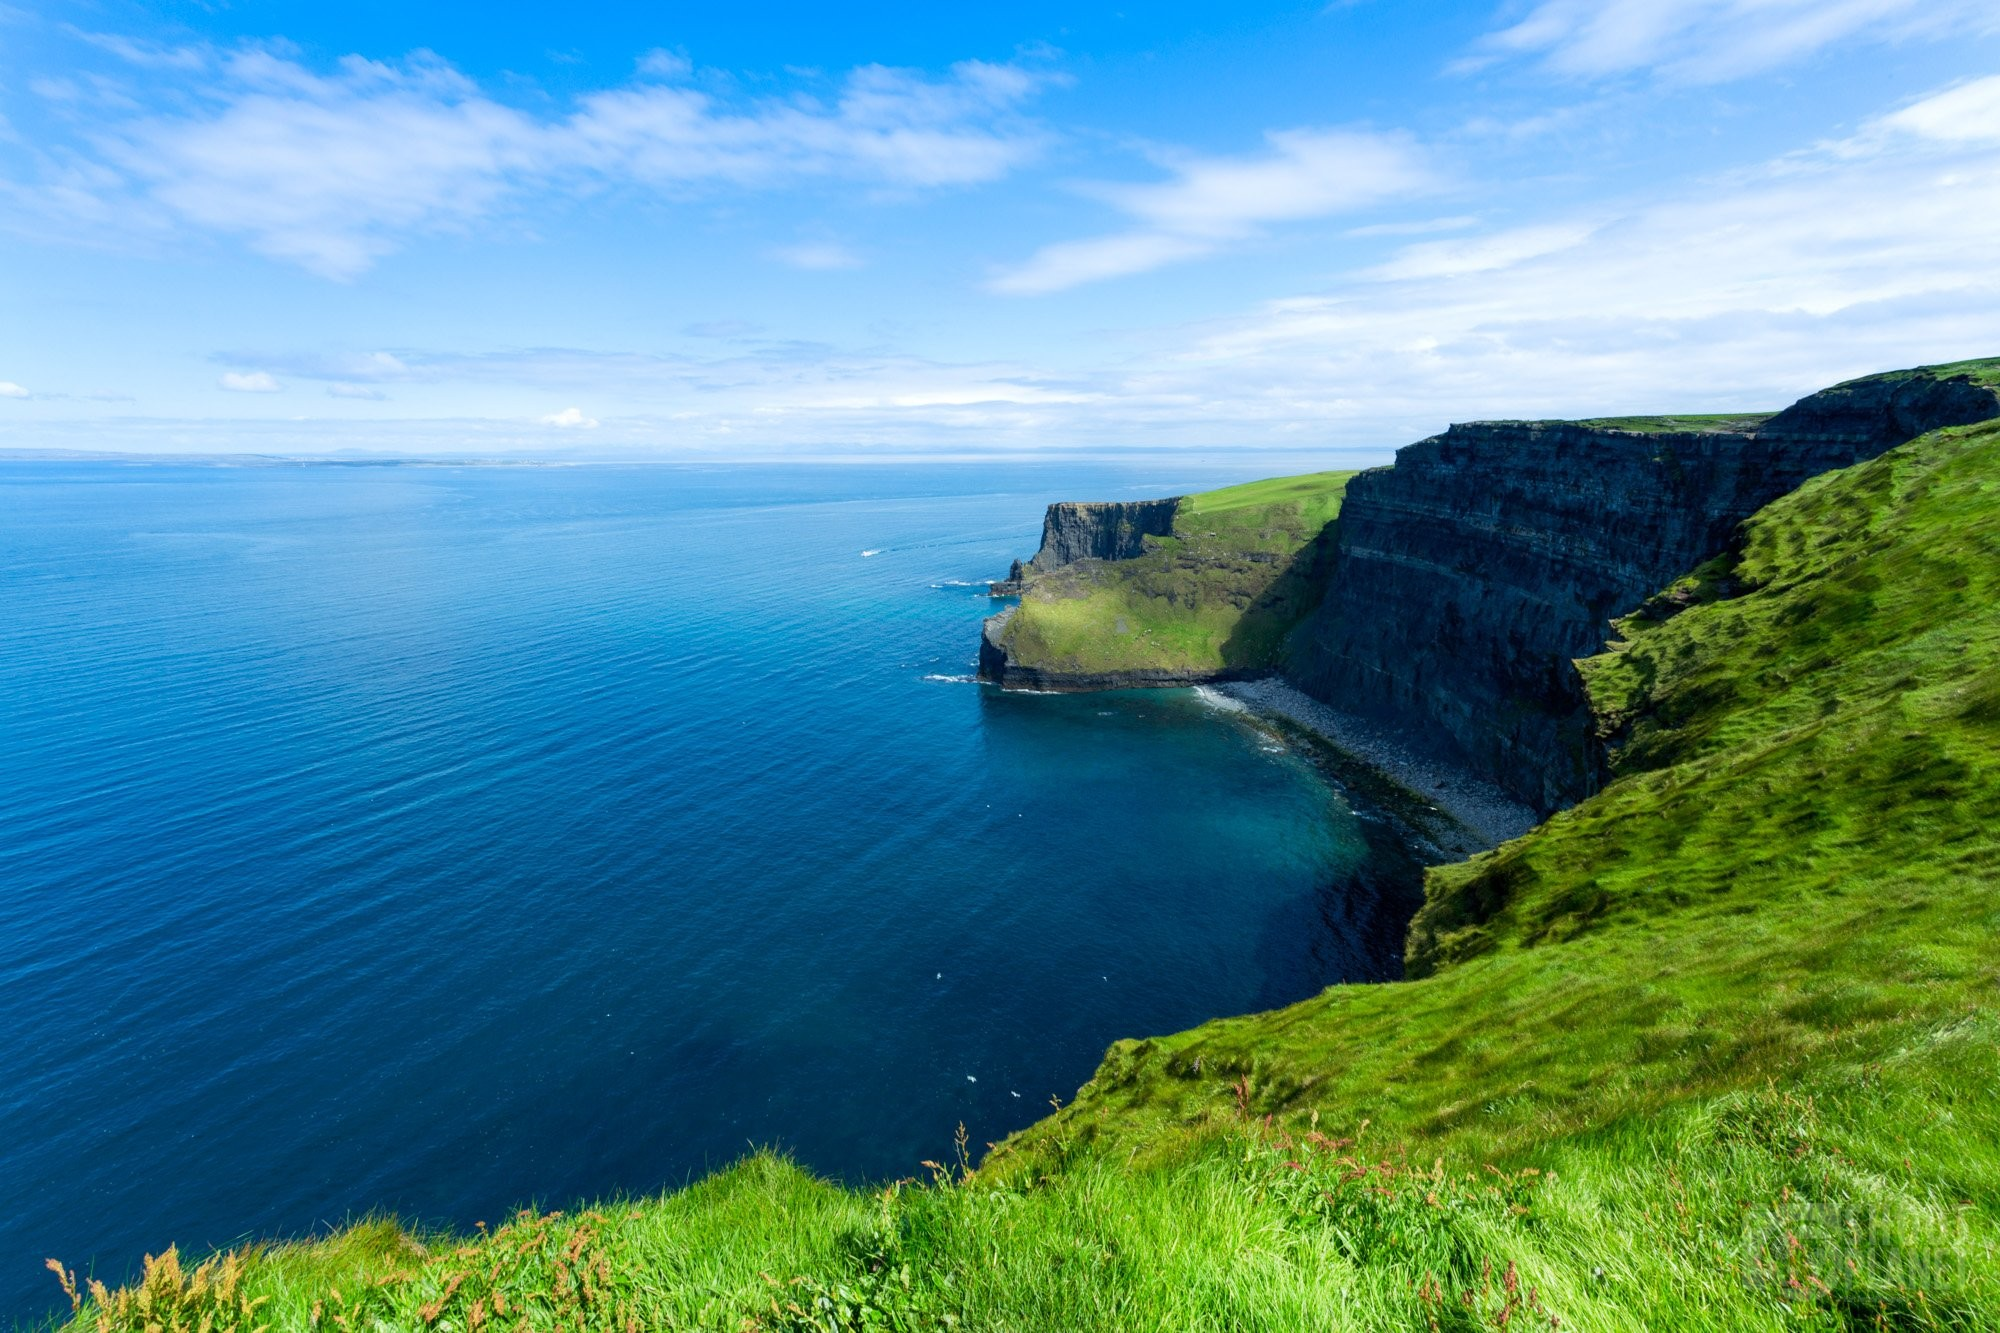 Cliffs of Moher landscape, Ireland Europe